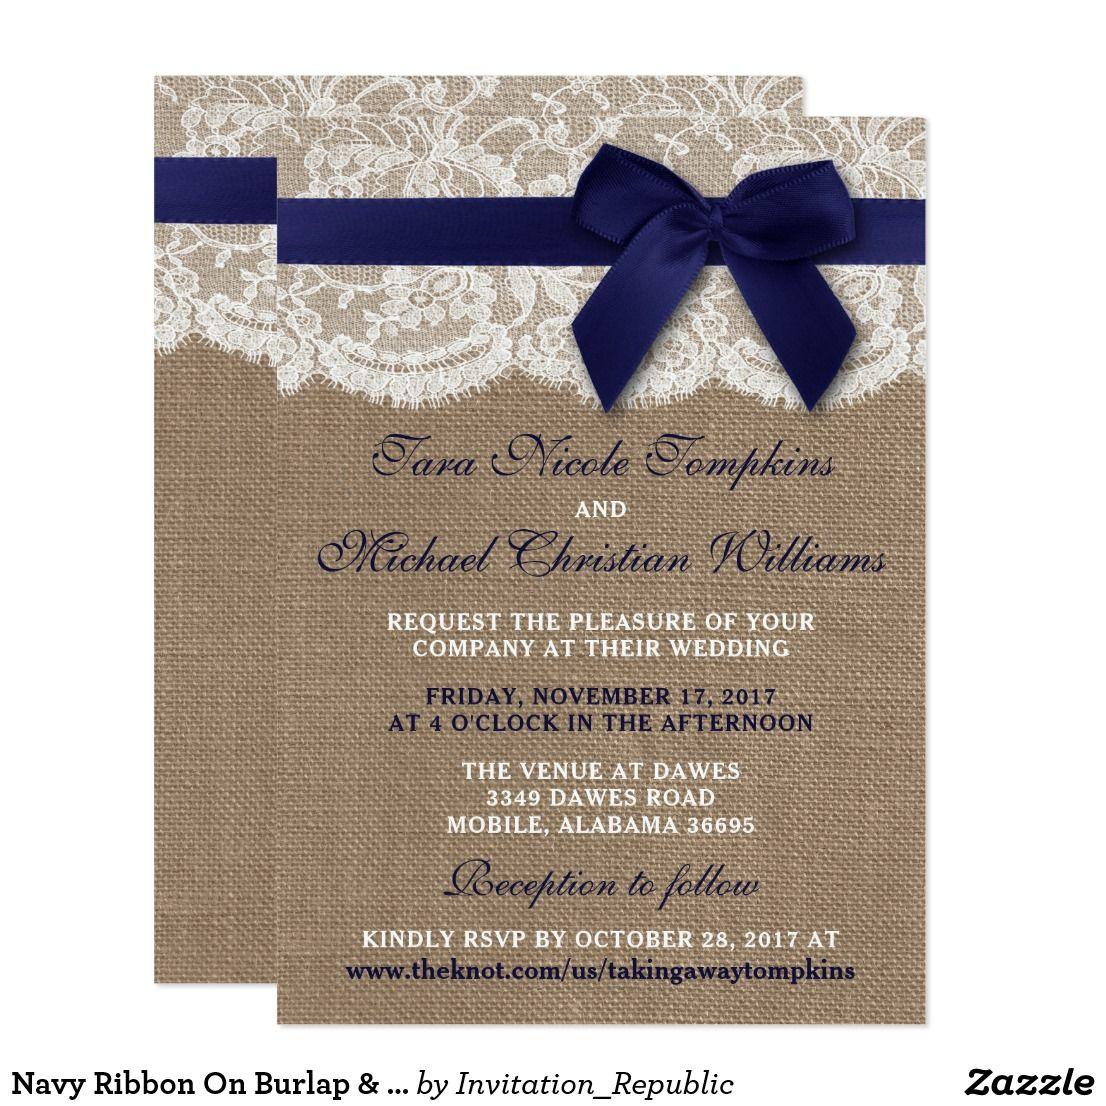 Navy Ribbon On Burlap Lace Wedding Invitation Zazzle Com Burlap Lace Wedding Invitations Burlap Lace Wedding Wedding Invitations Diy